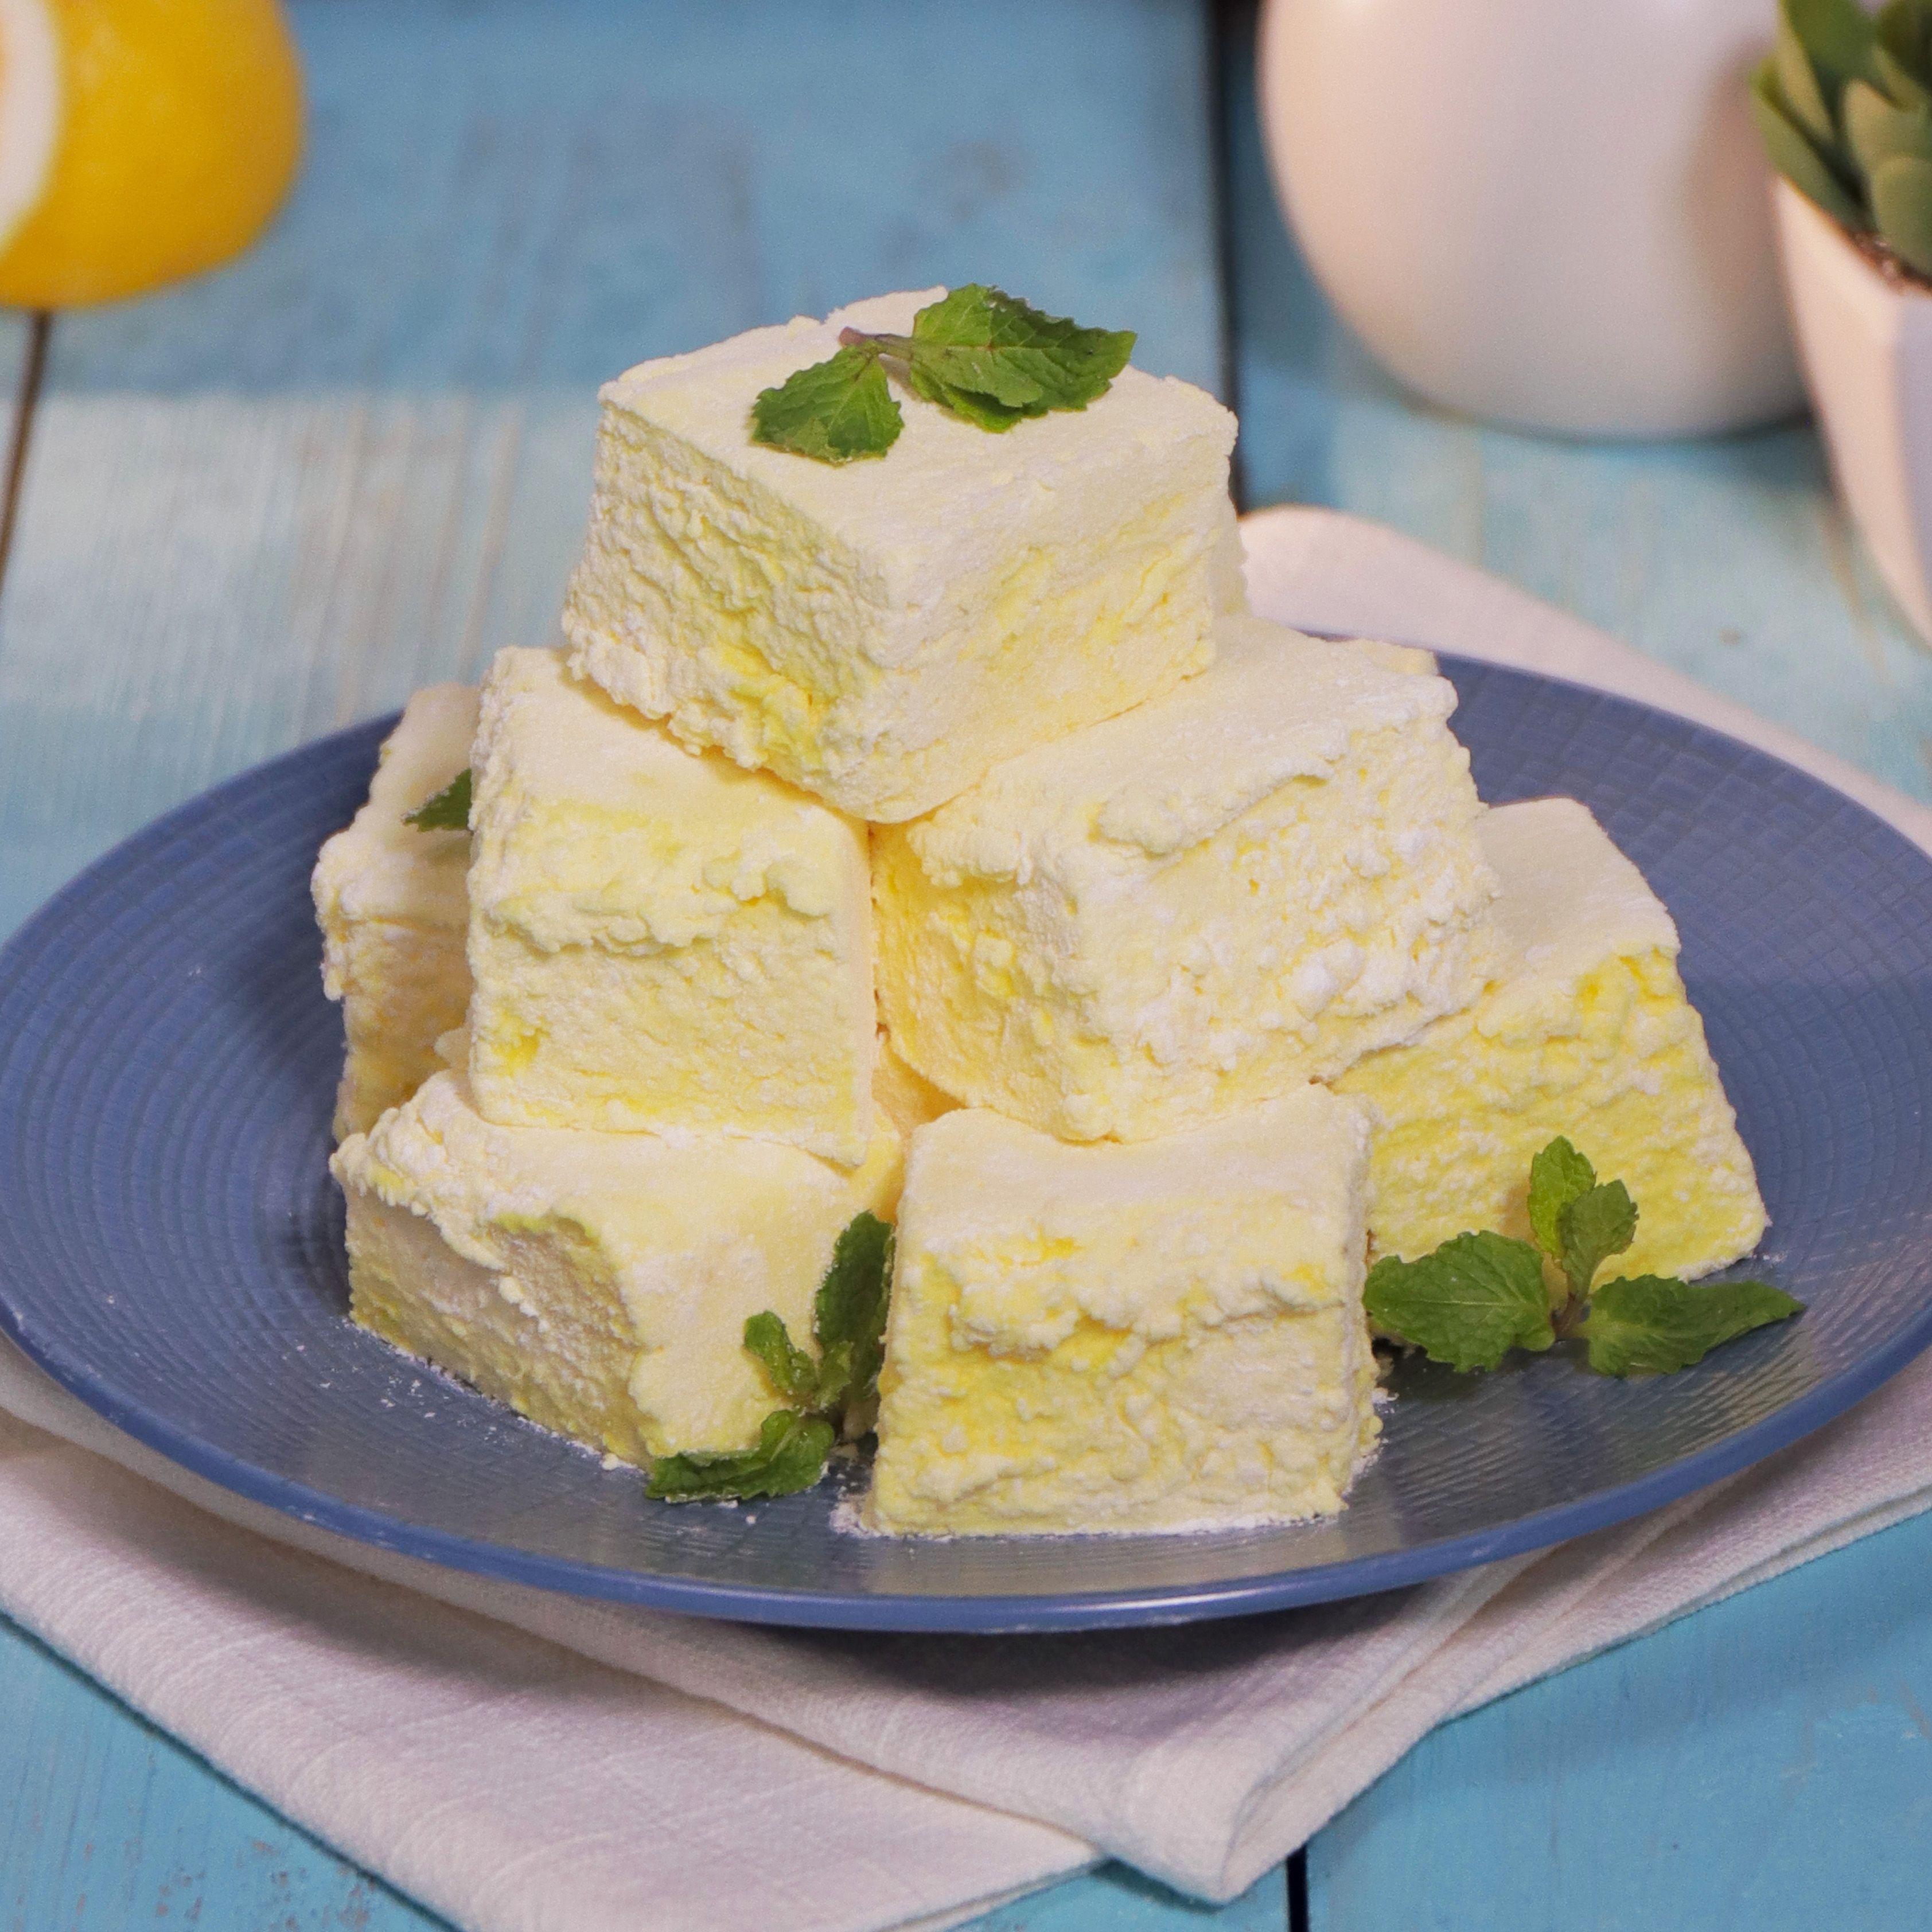 Resep Lemon Marshmallow Resep Di 2020 Hidangan Penutup Camilan Marshmallow